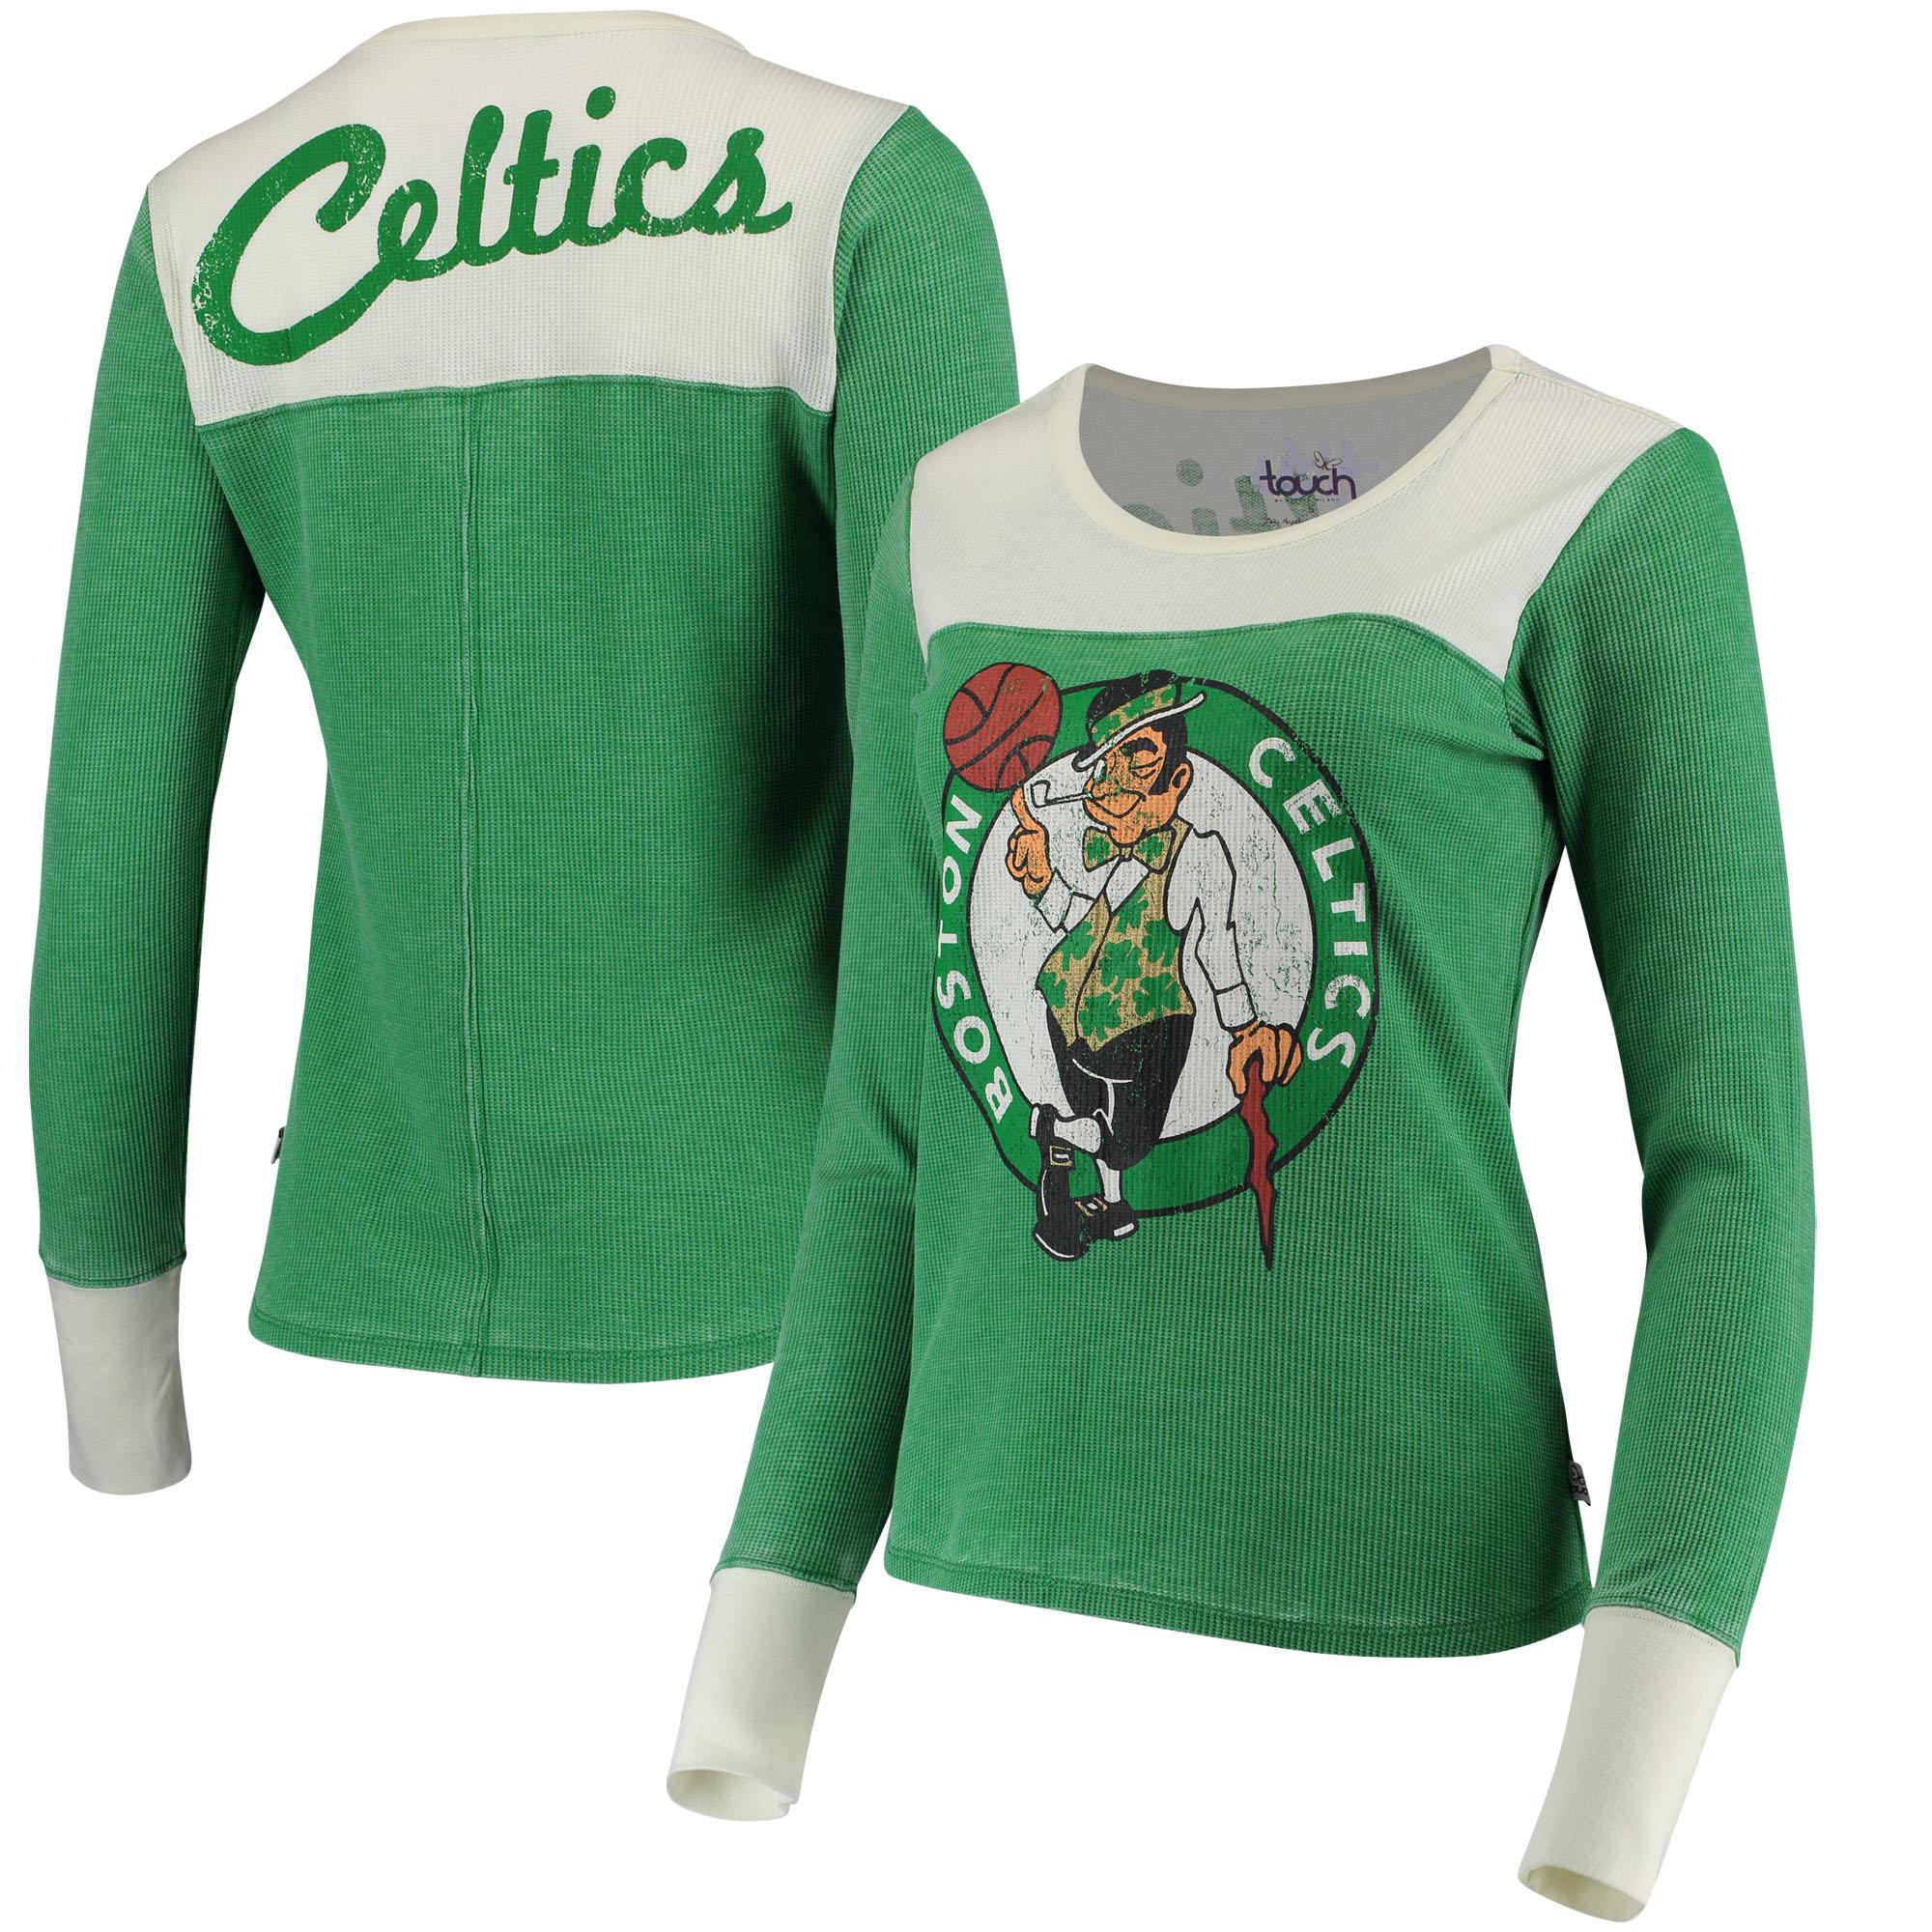 Boston Celtics G-III Sports by Carl Banks Women's Blindside Long Sleeve Tri-Blend Thermal T-Shirt - Kelly Green/White